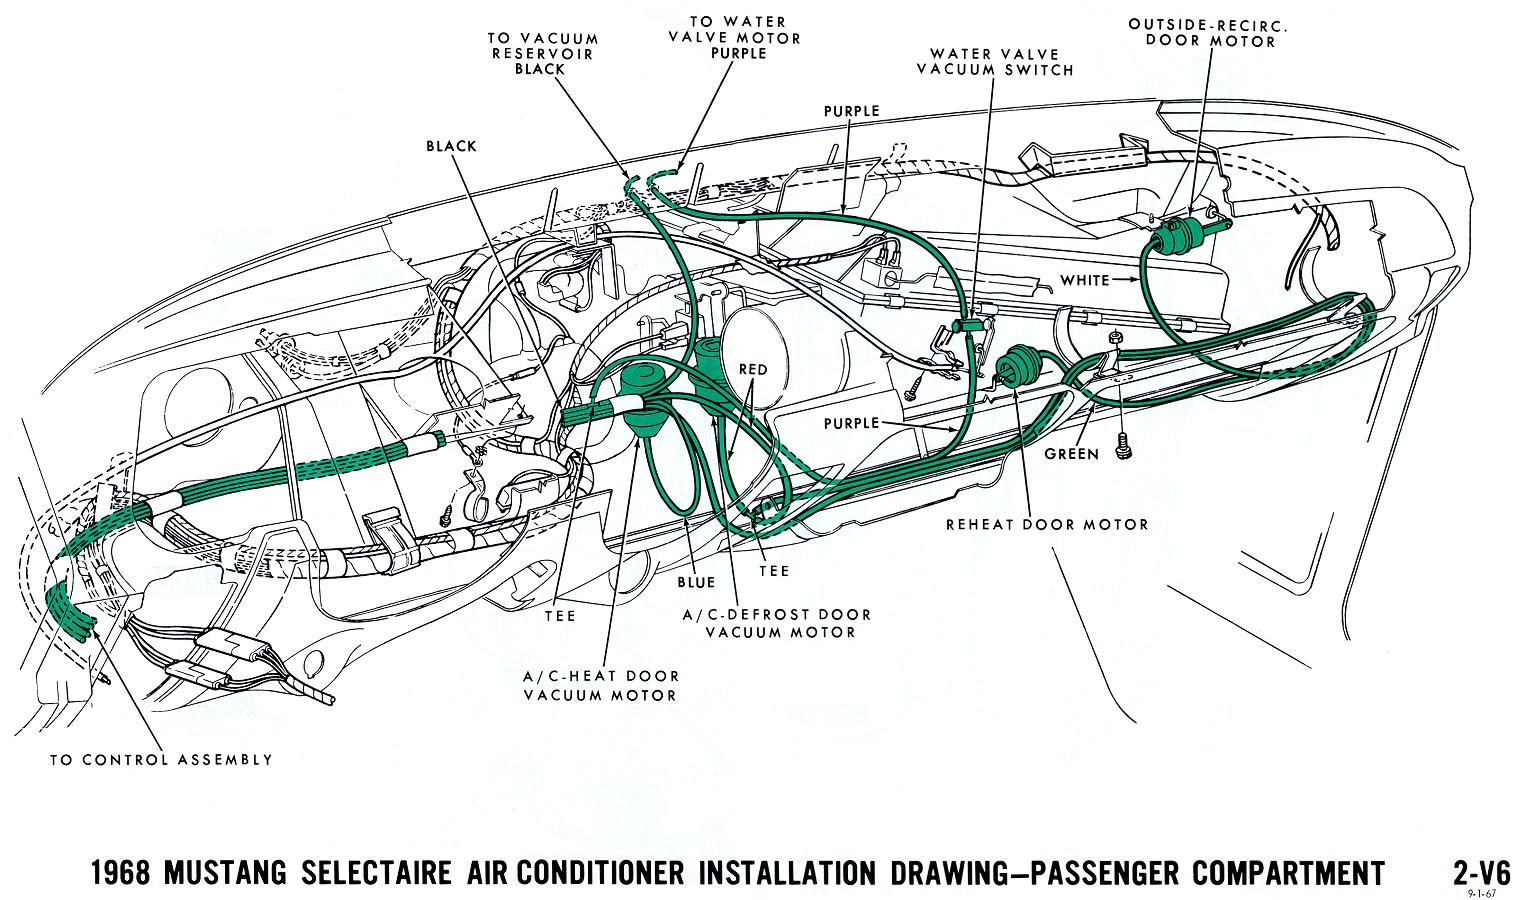 1968 mustang vacuum diagram air conditioning interior jpg